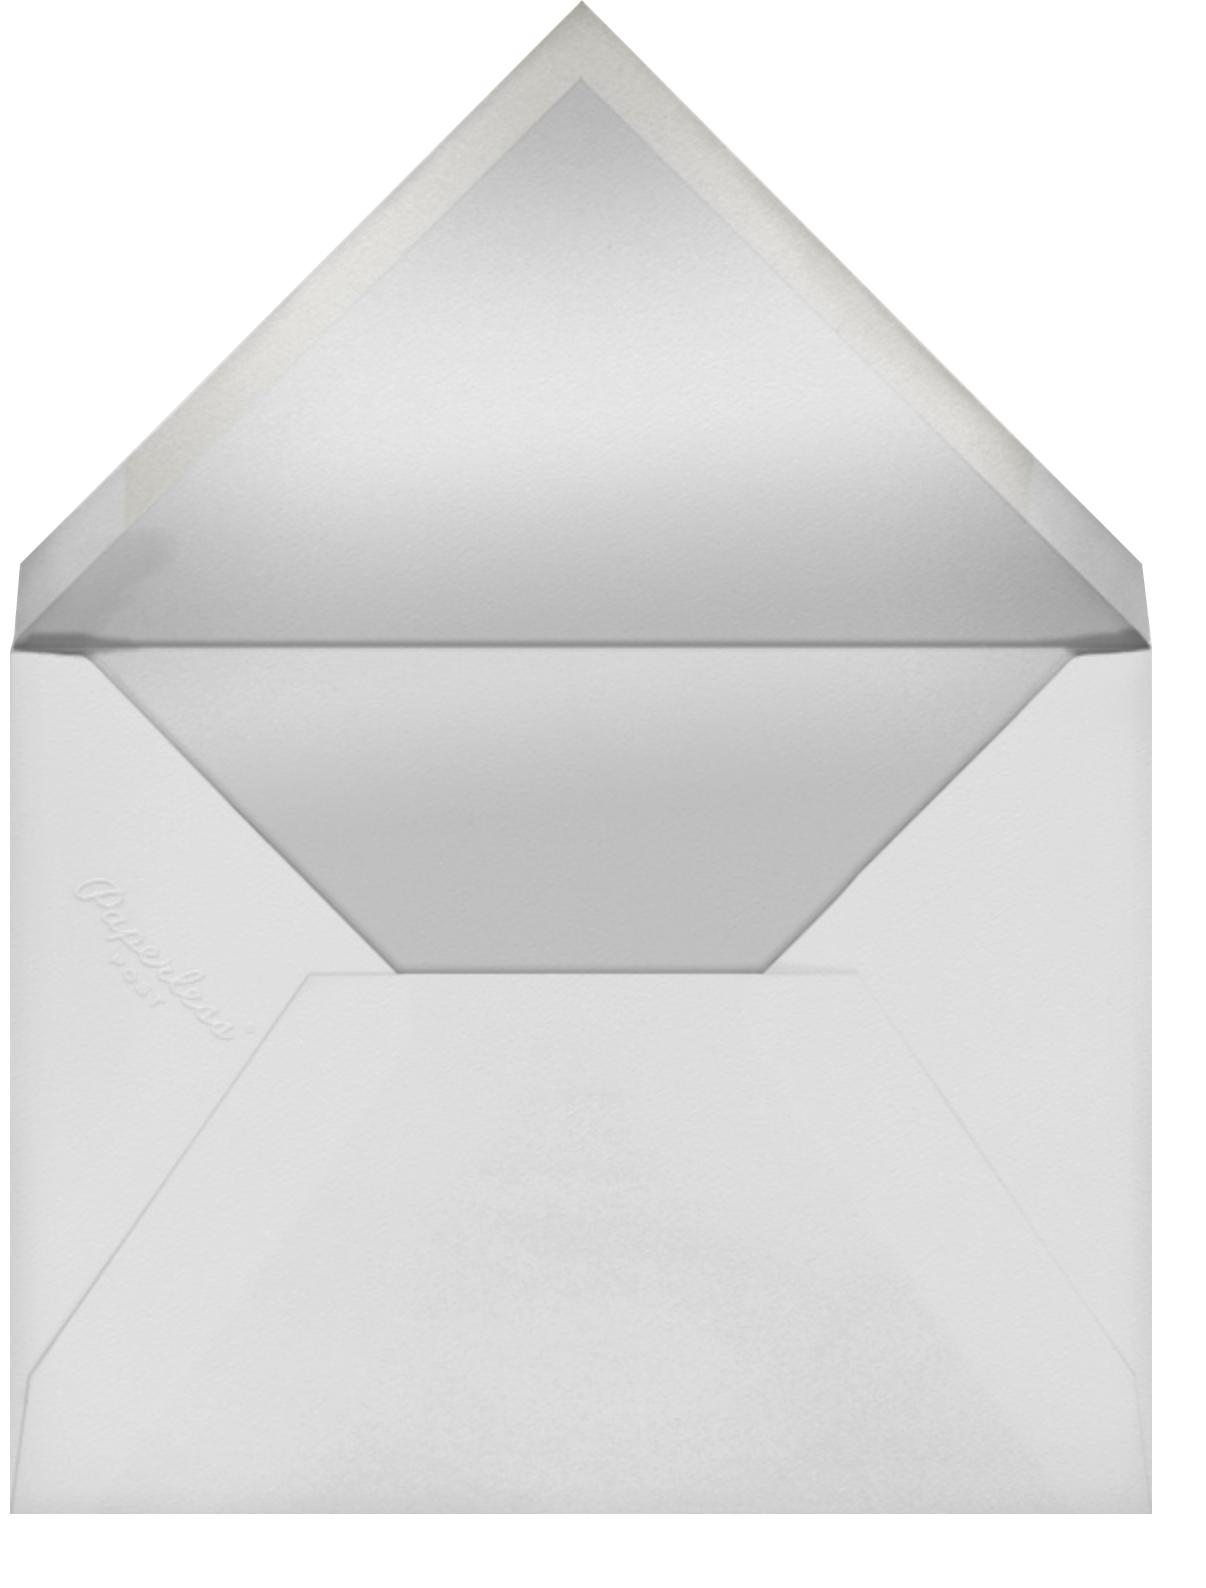 Faithful (Menu) - Gray - Paperless Post - Menus - envelope back